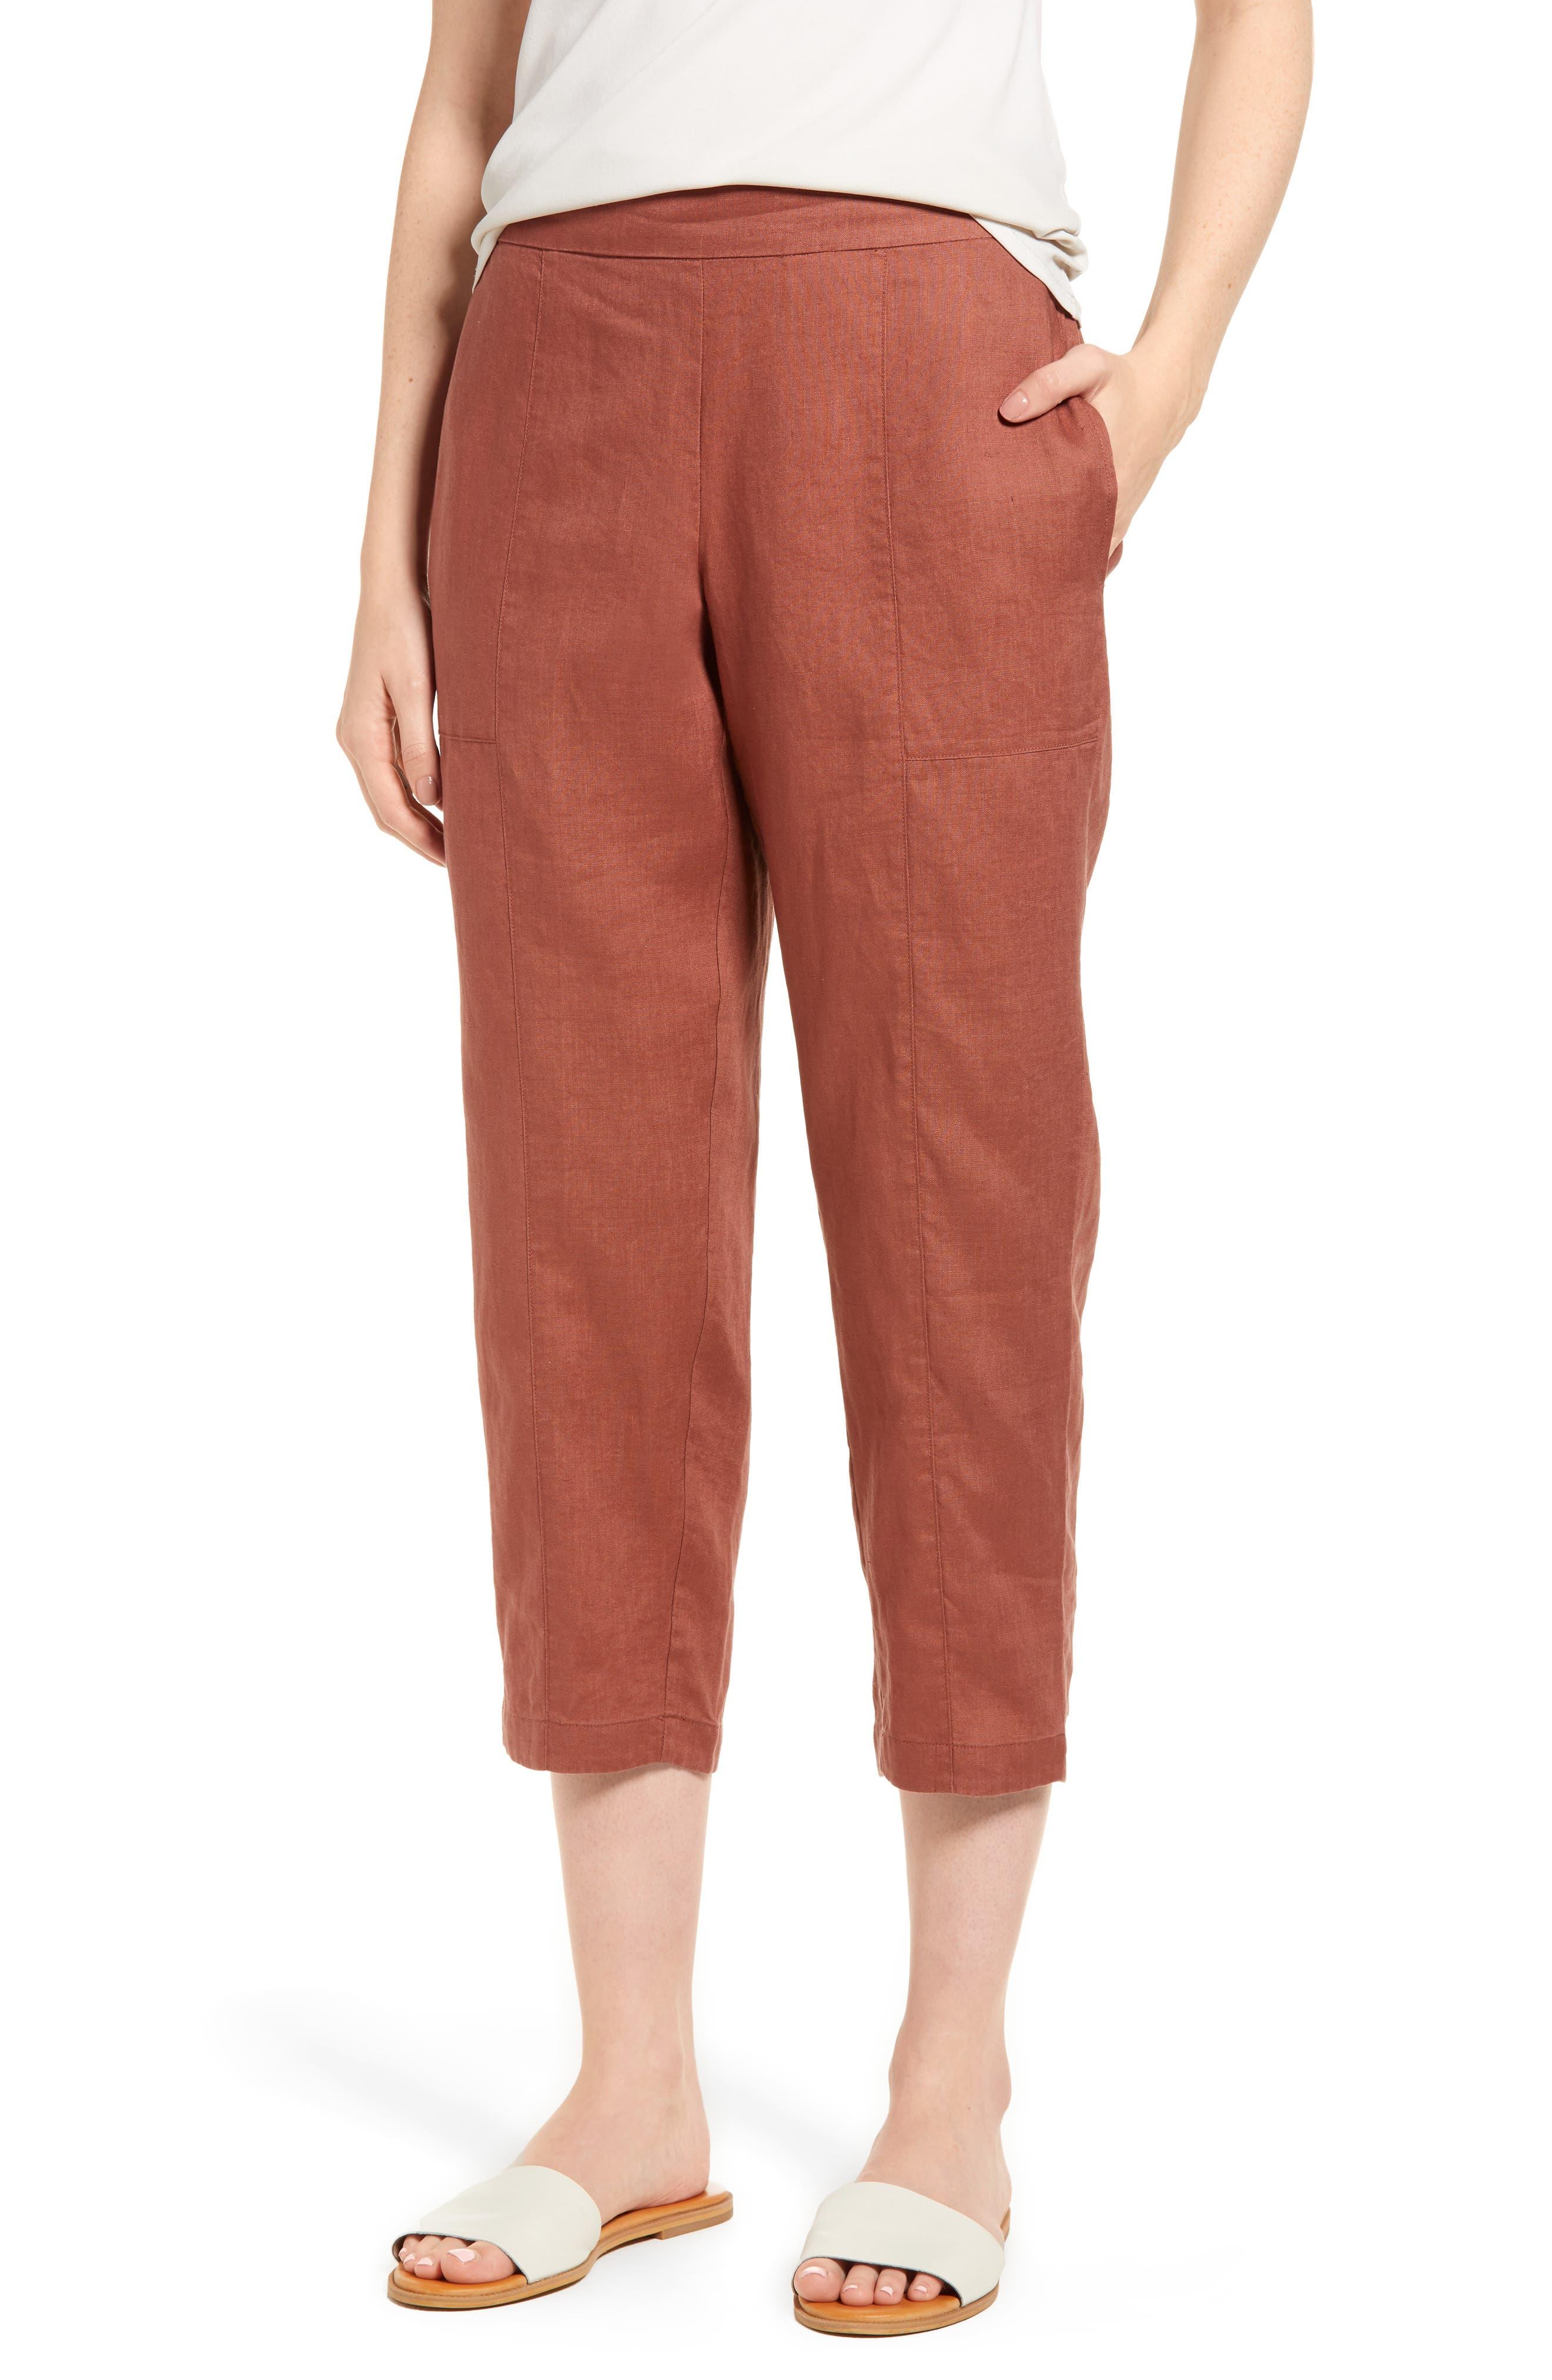 Organic Linen Crop Pants,                             Main thumbnail 1, color,                             Russet